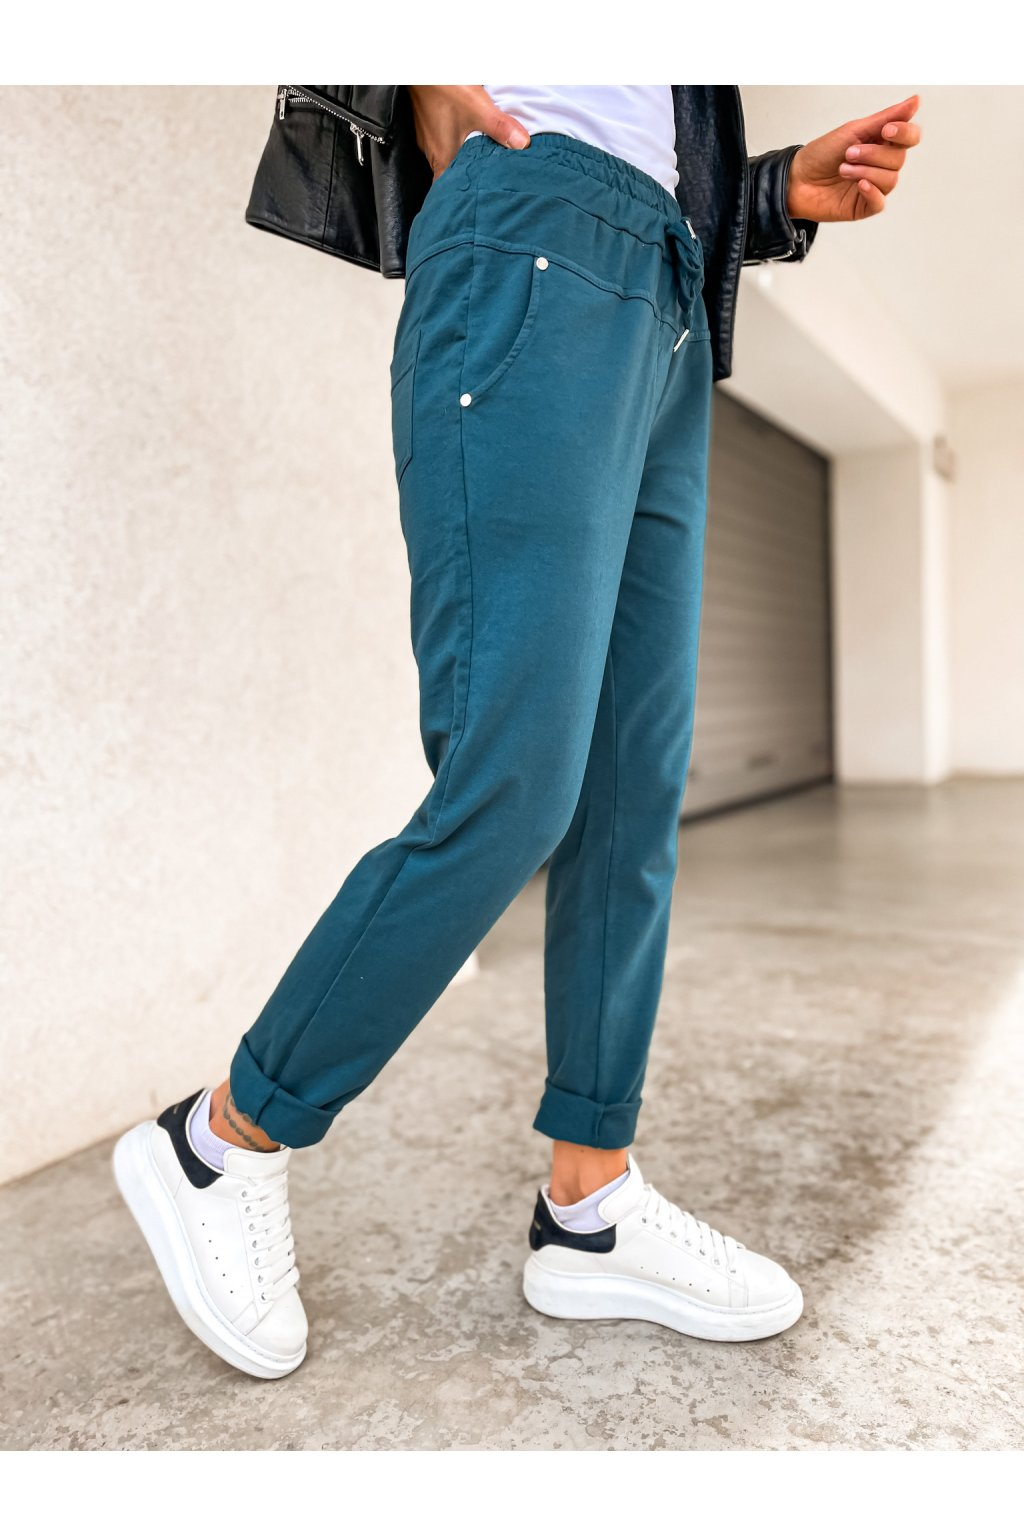 damske teplakove kalhoty pascall smaragd eshopat cz 1